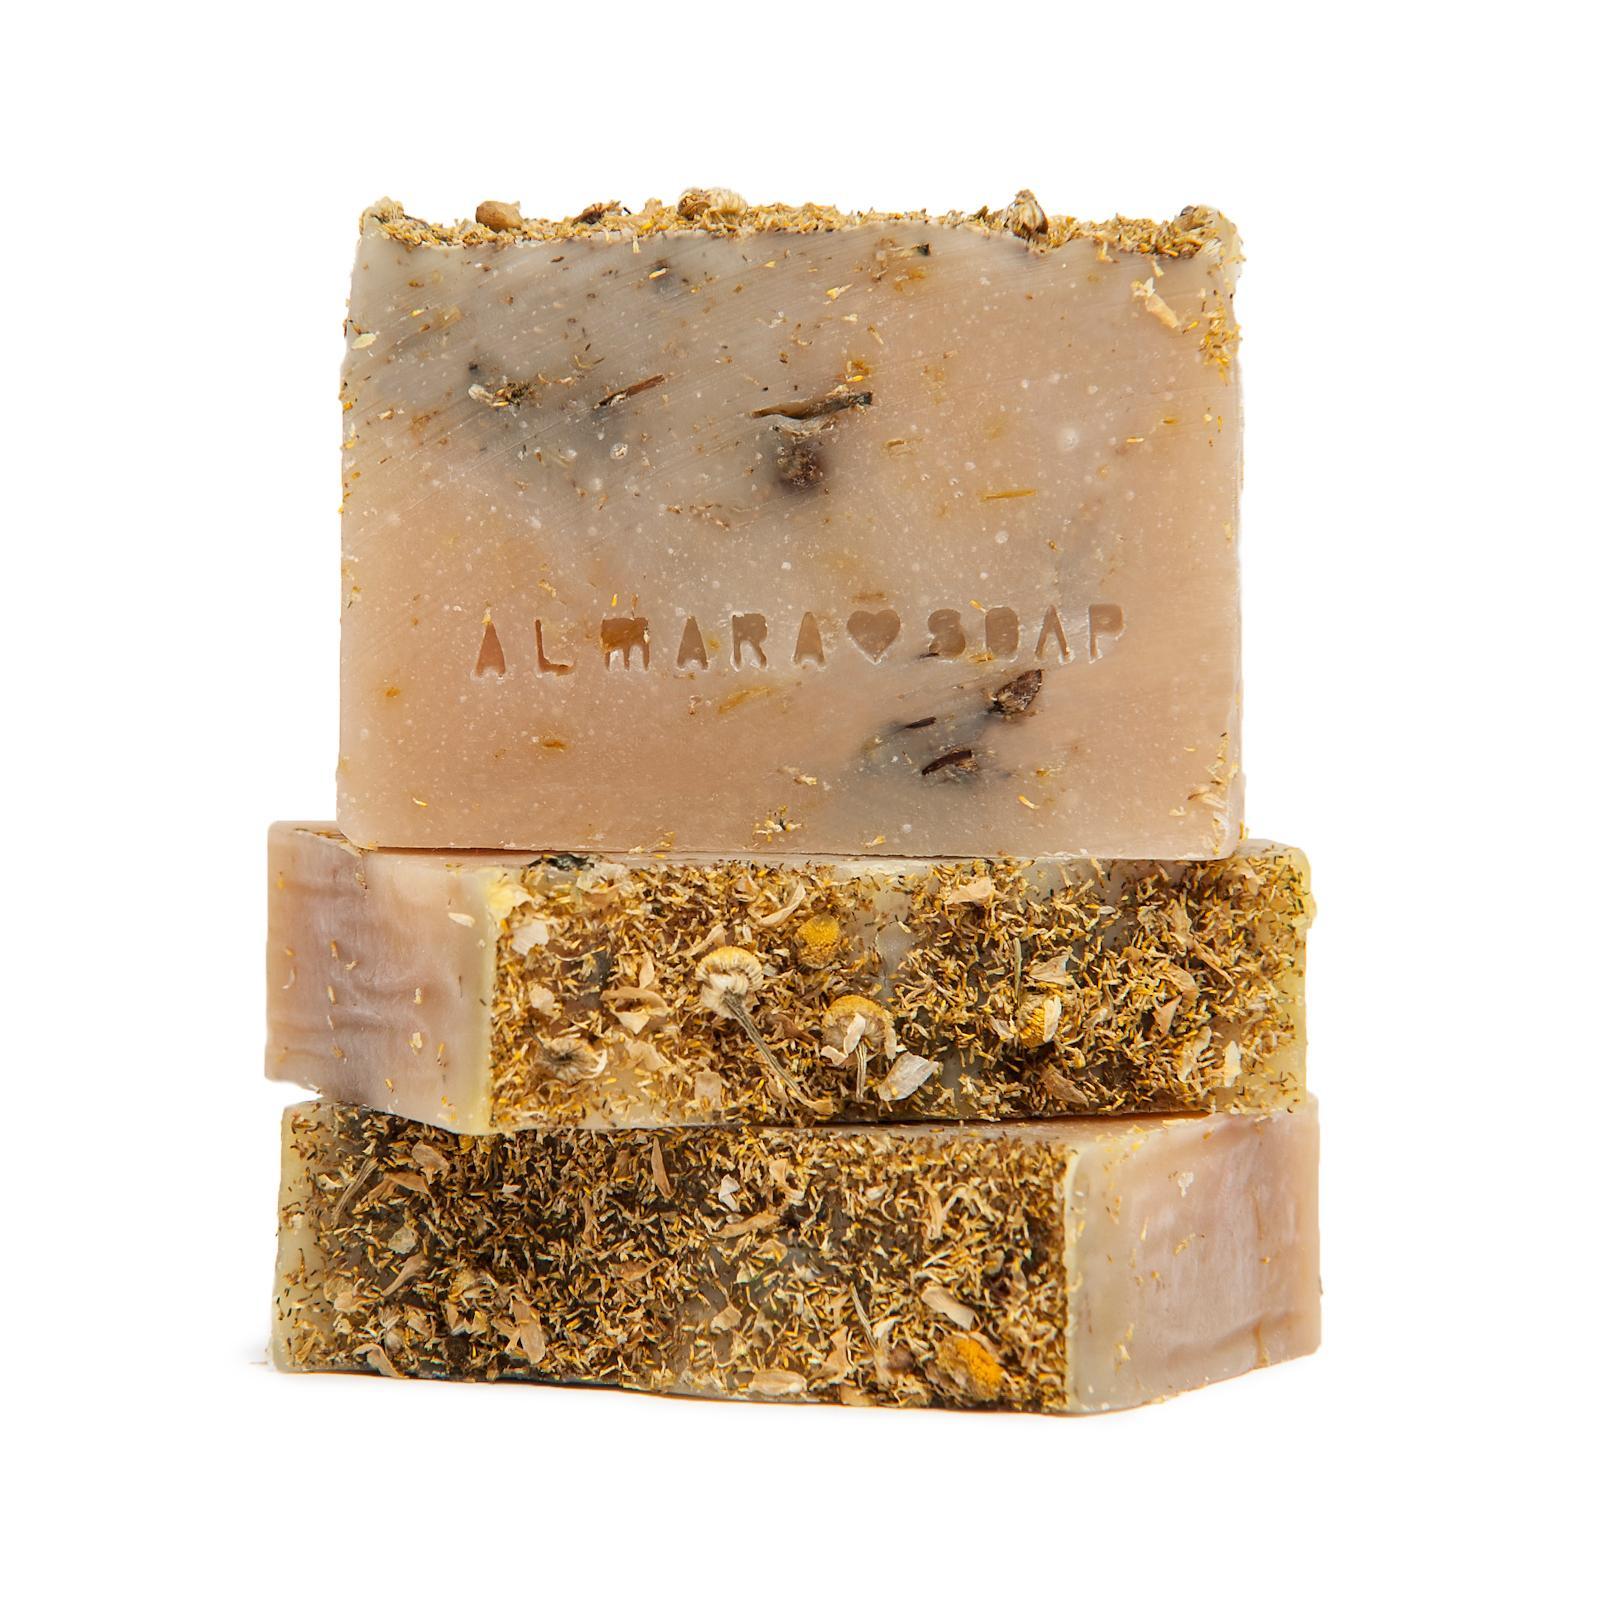 Almara Soap Mýdlo Intimní 85 g